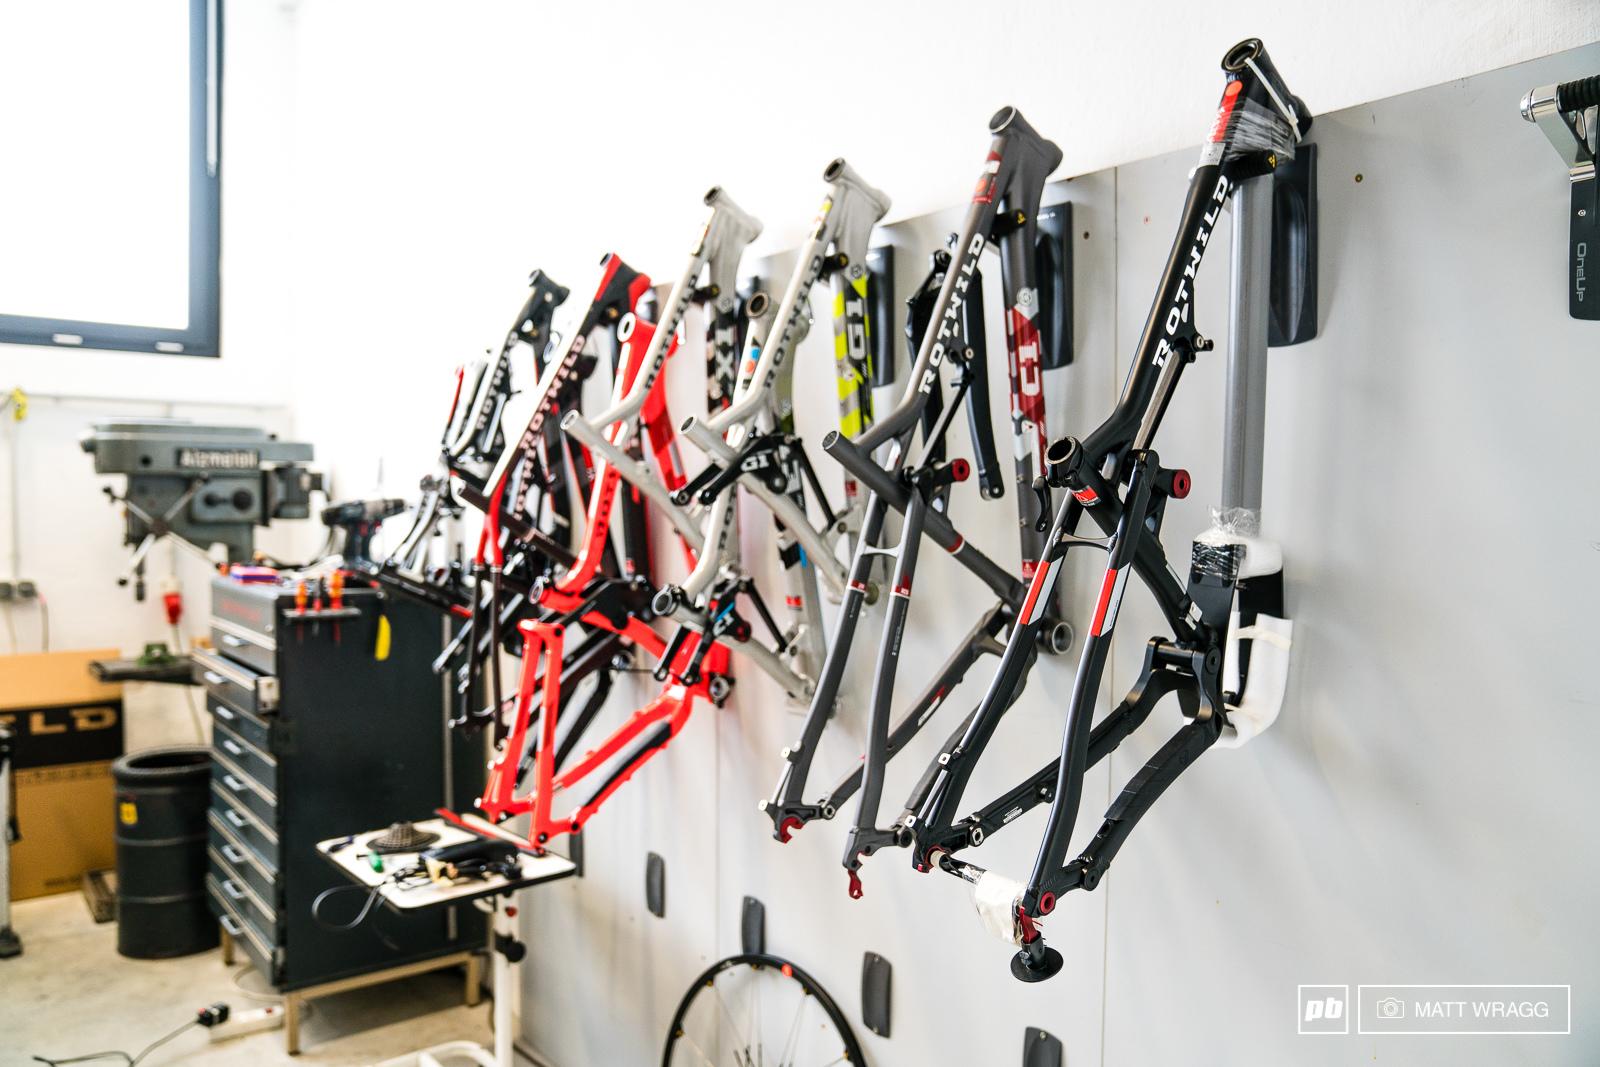 Inside Rotwild Bikes